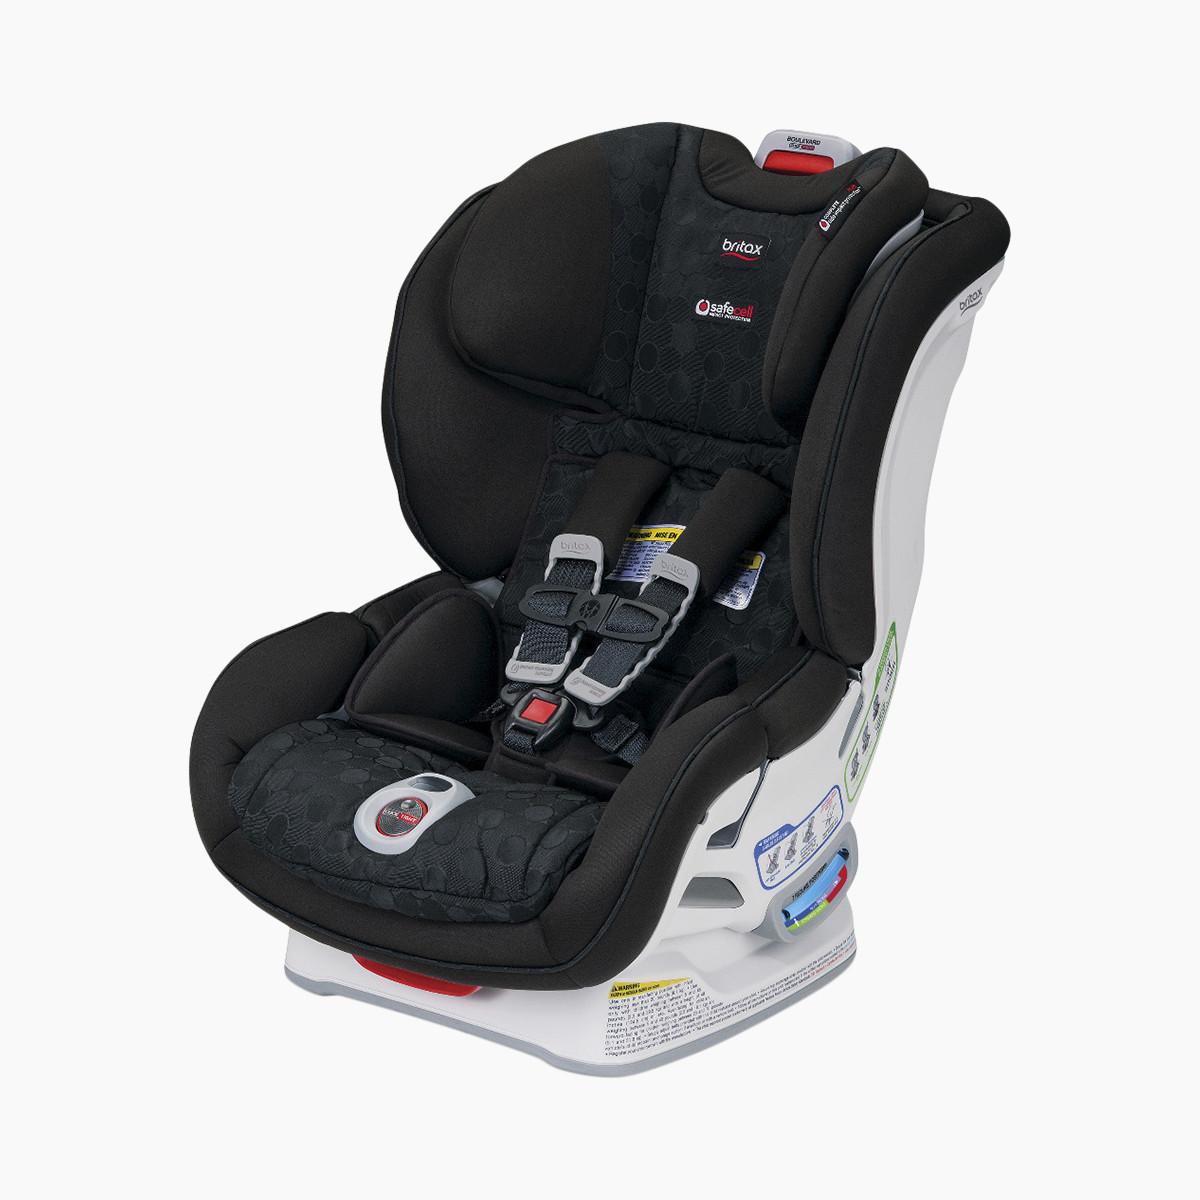 Britaxboulevard Click Convertible Car Seat